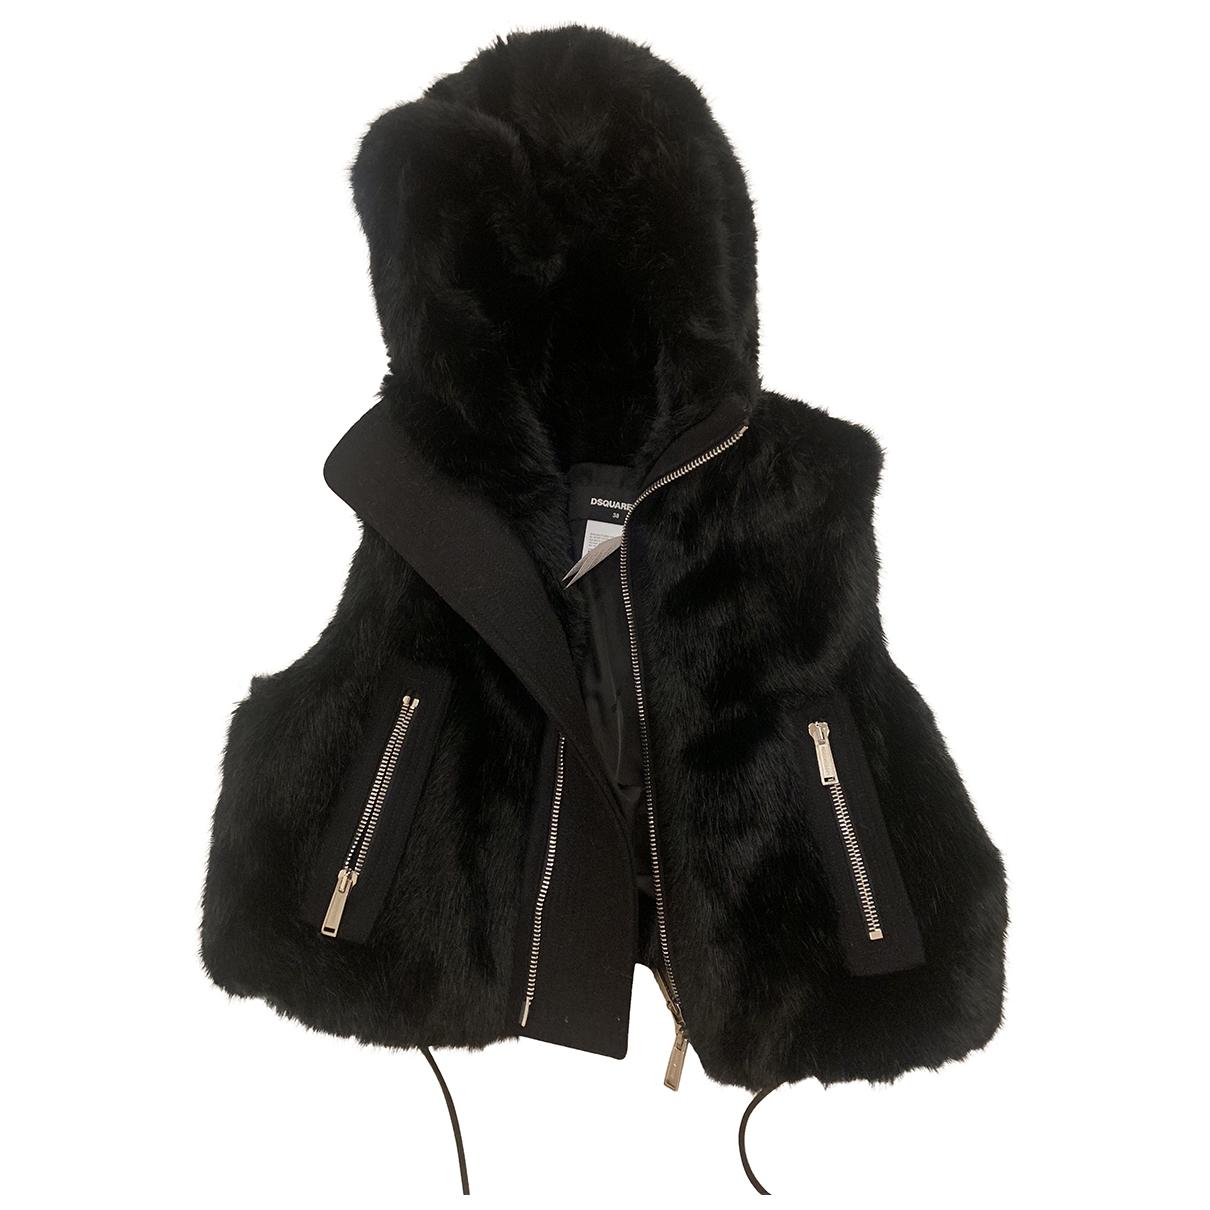 Dsquared2 \N Black Faux fur jacket for Women 38 IT